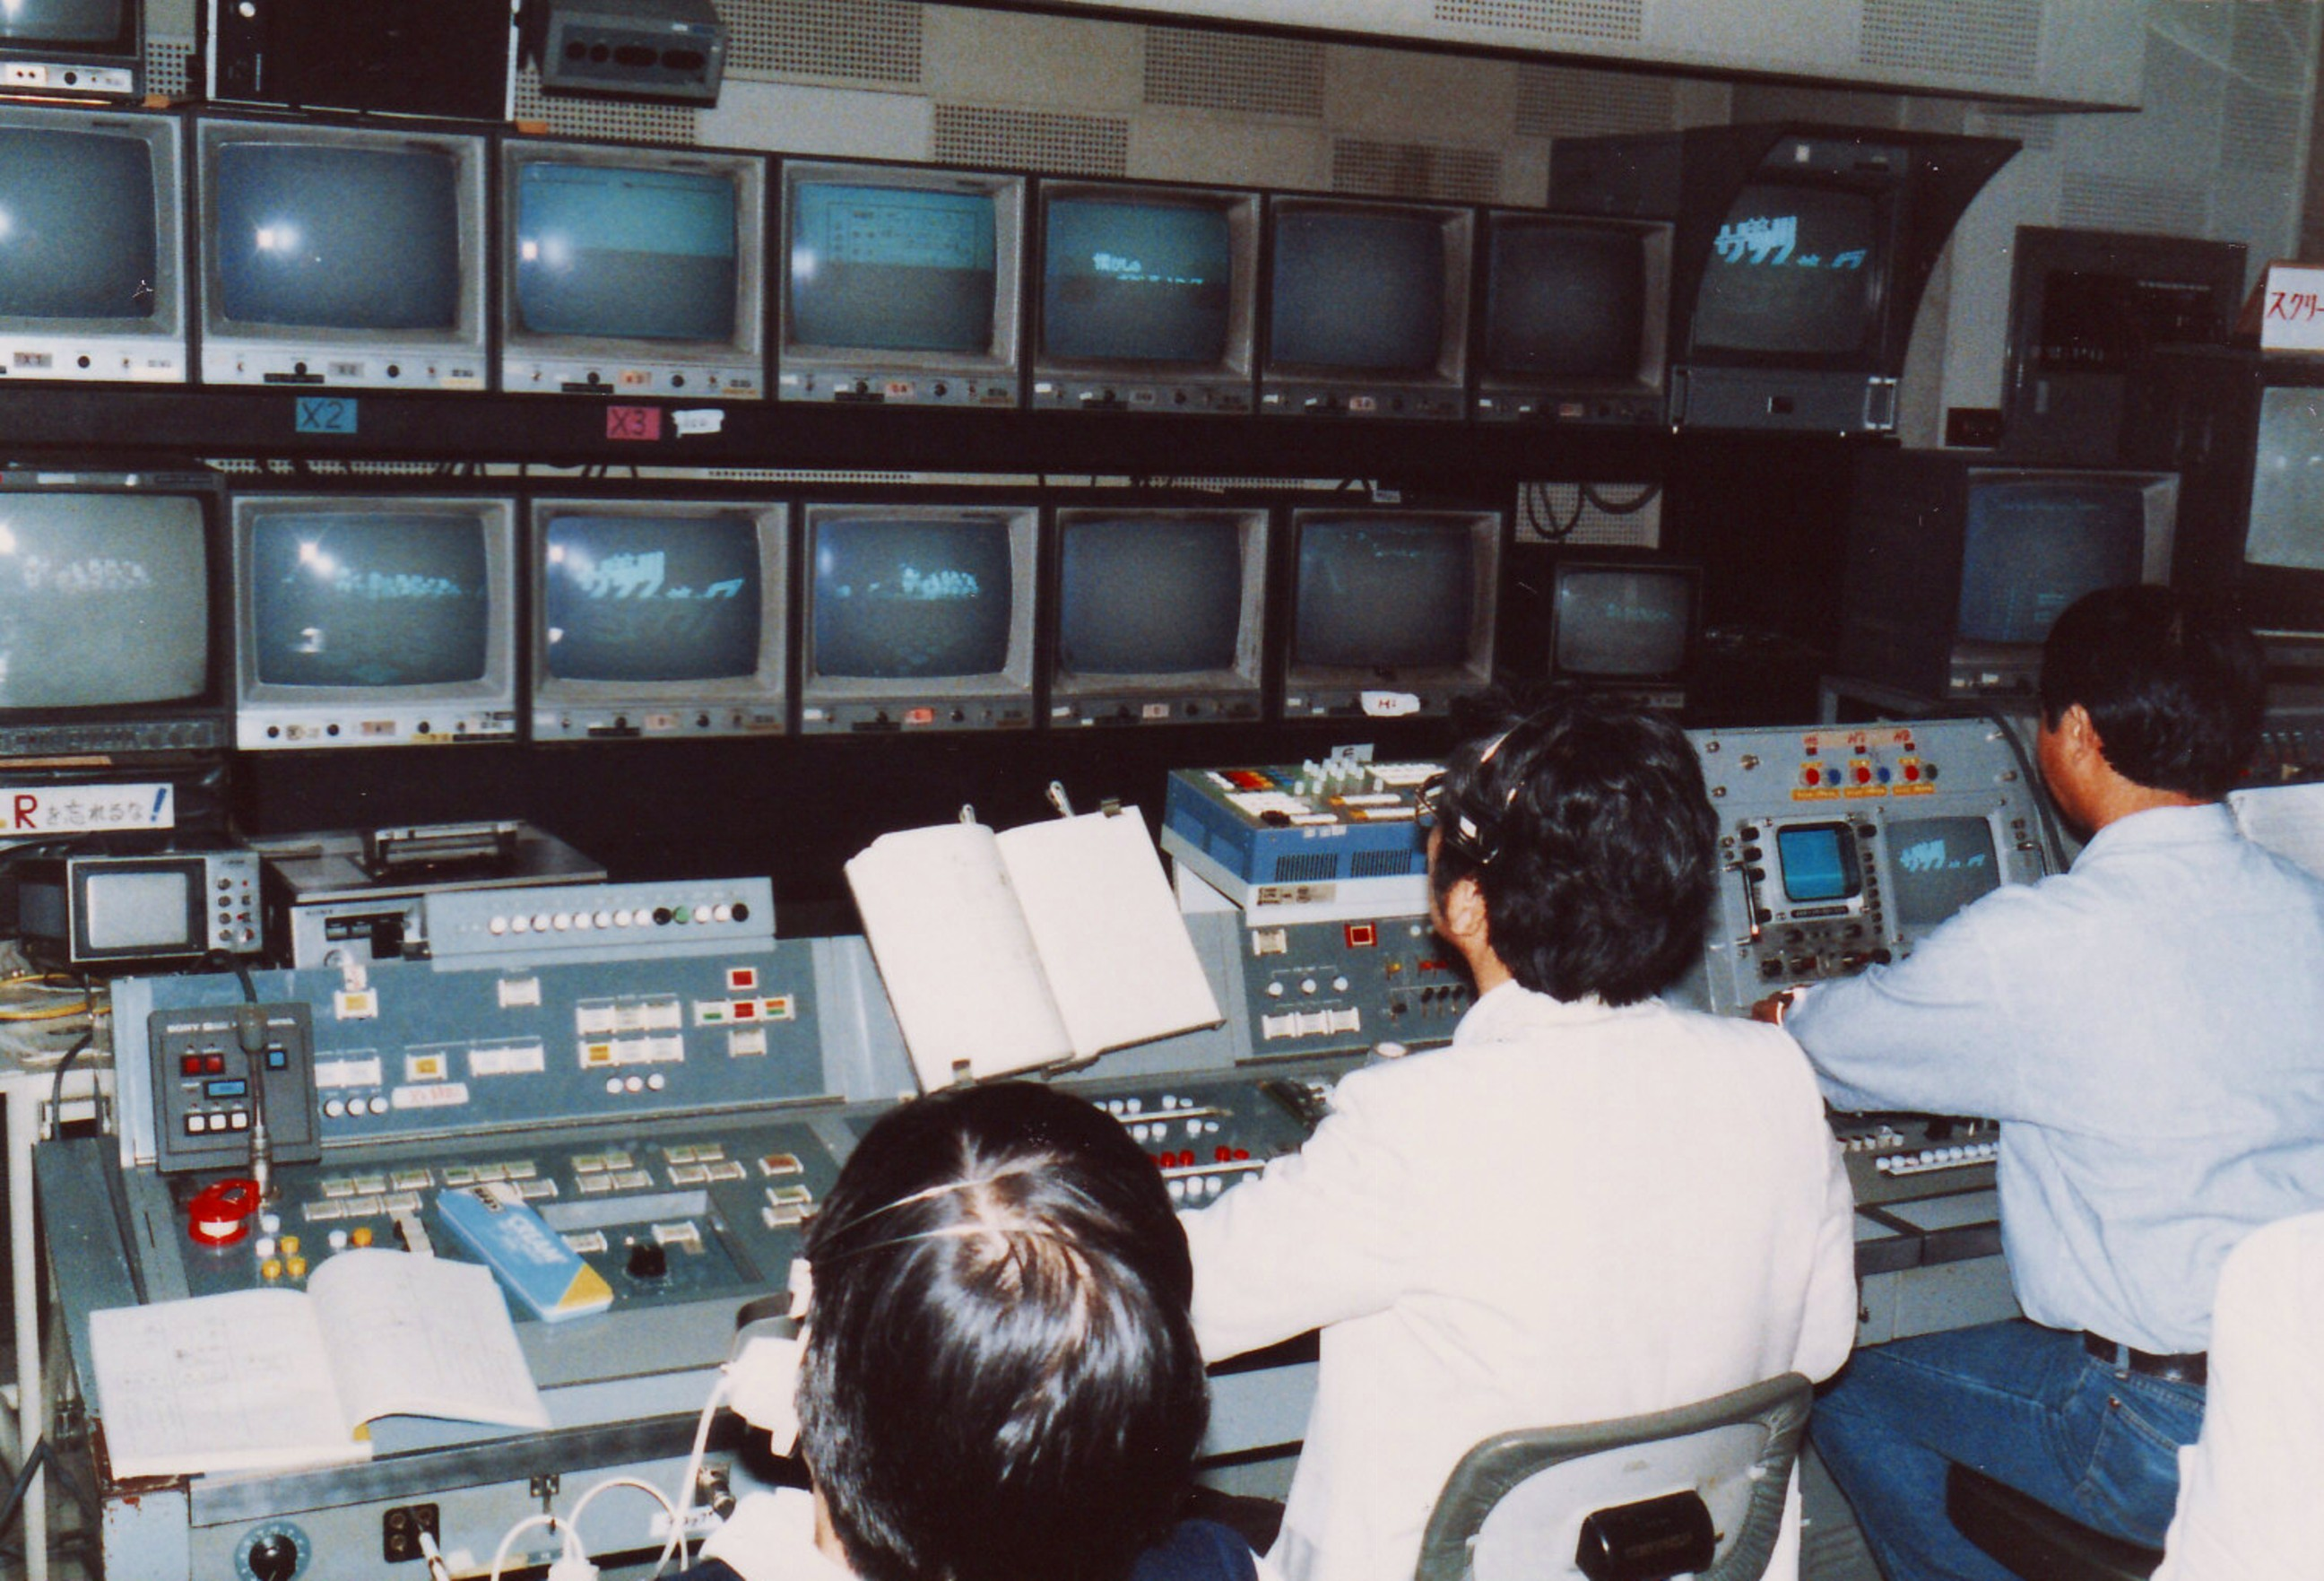 Filenhkn Tv Studion Ohjaamo Master Control Room Nhk Tokyojpg